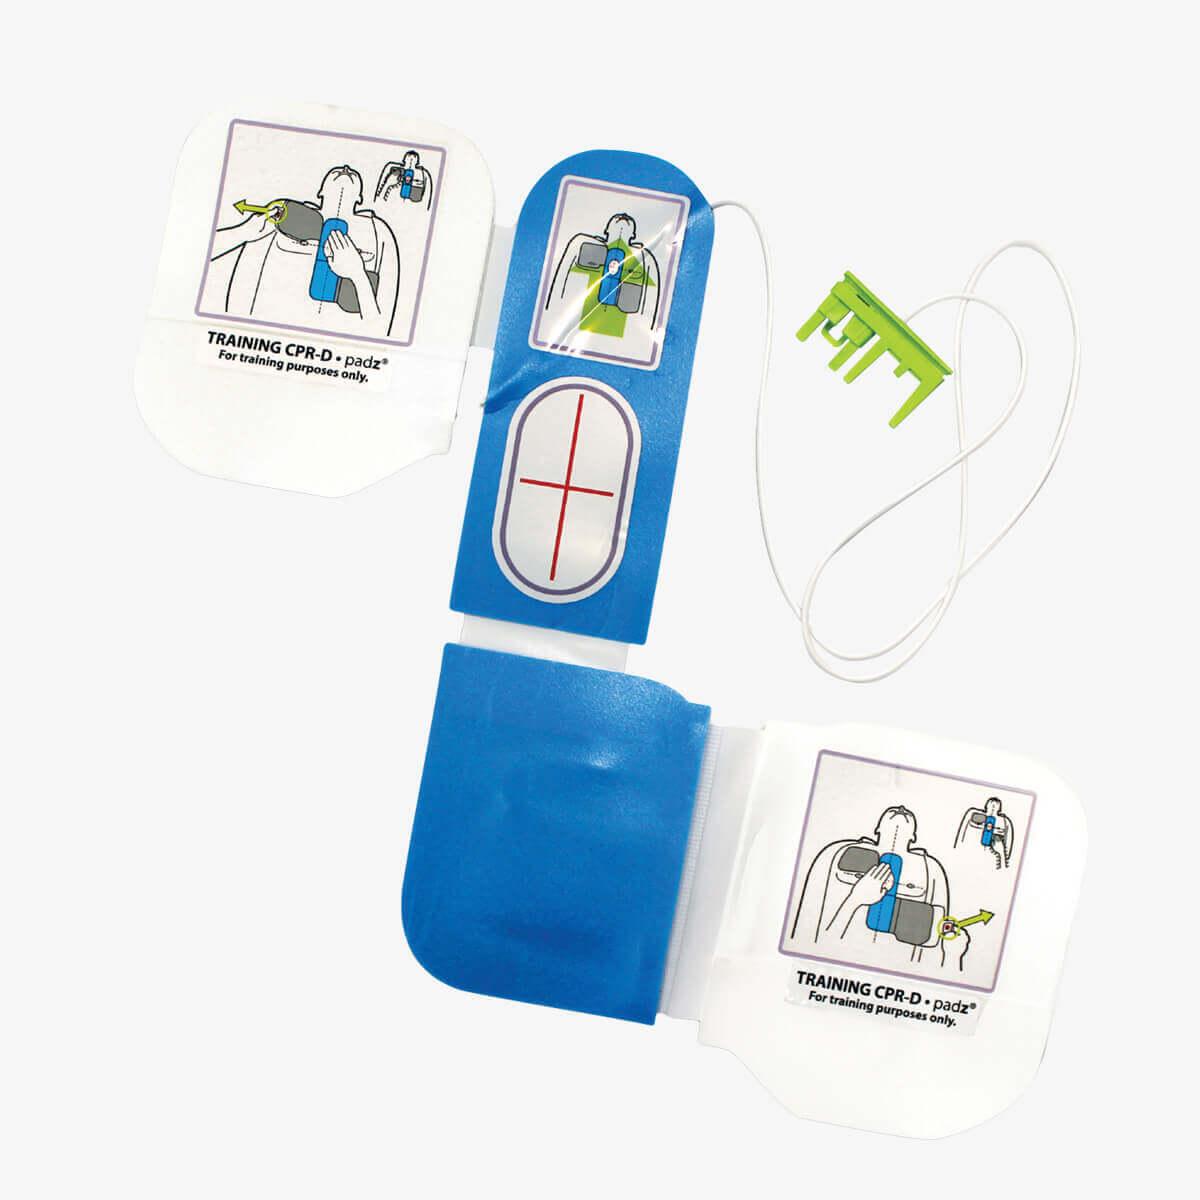 ZOLL CPR D Padz Trainingselektrode für den ZOLL AED Plus Trainer2